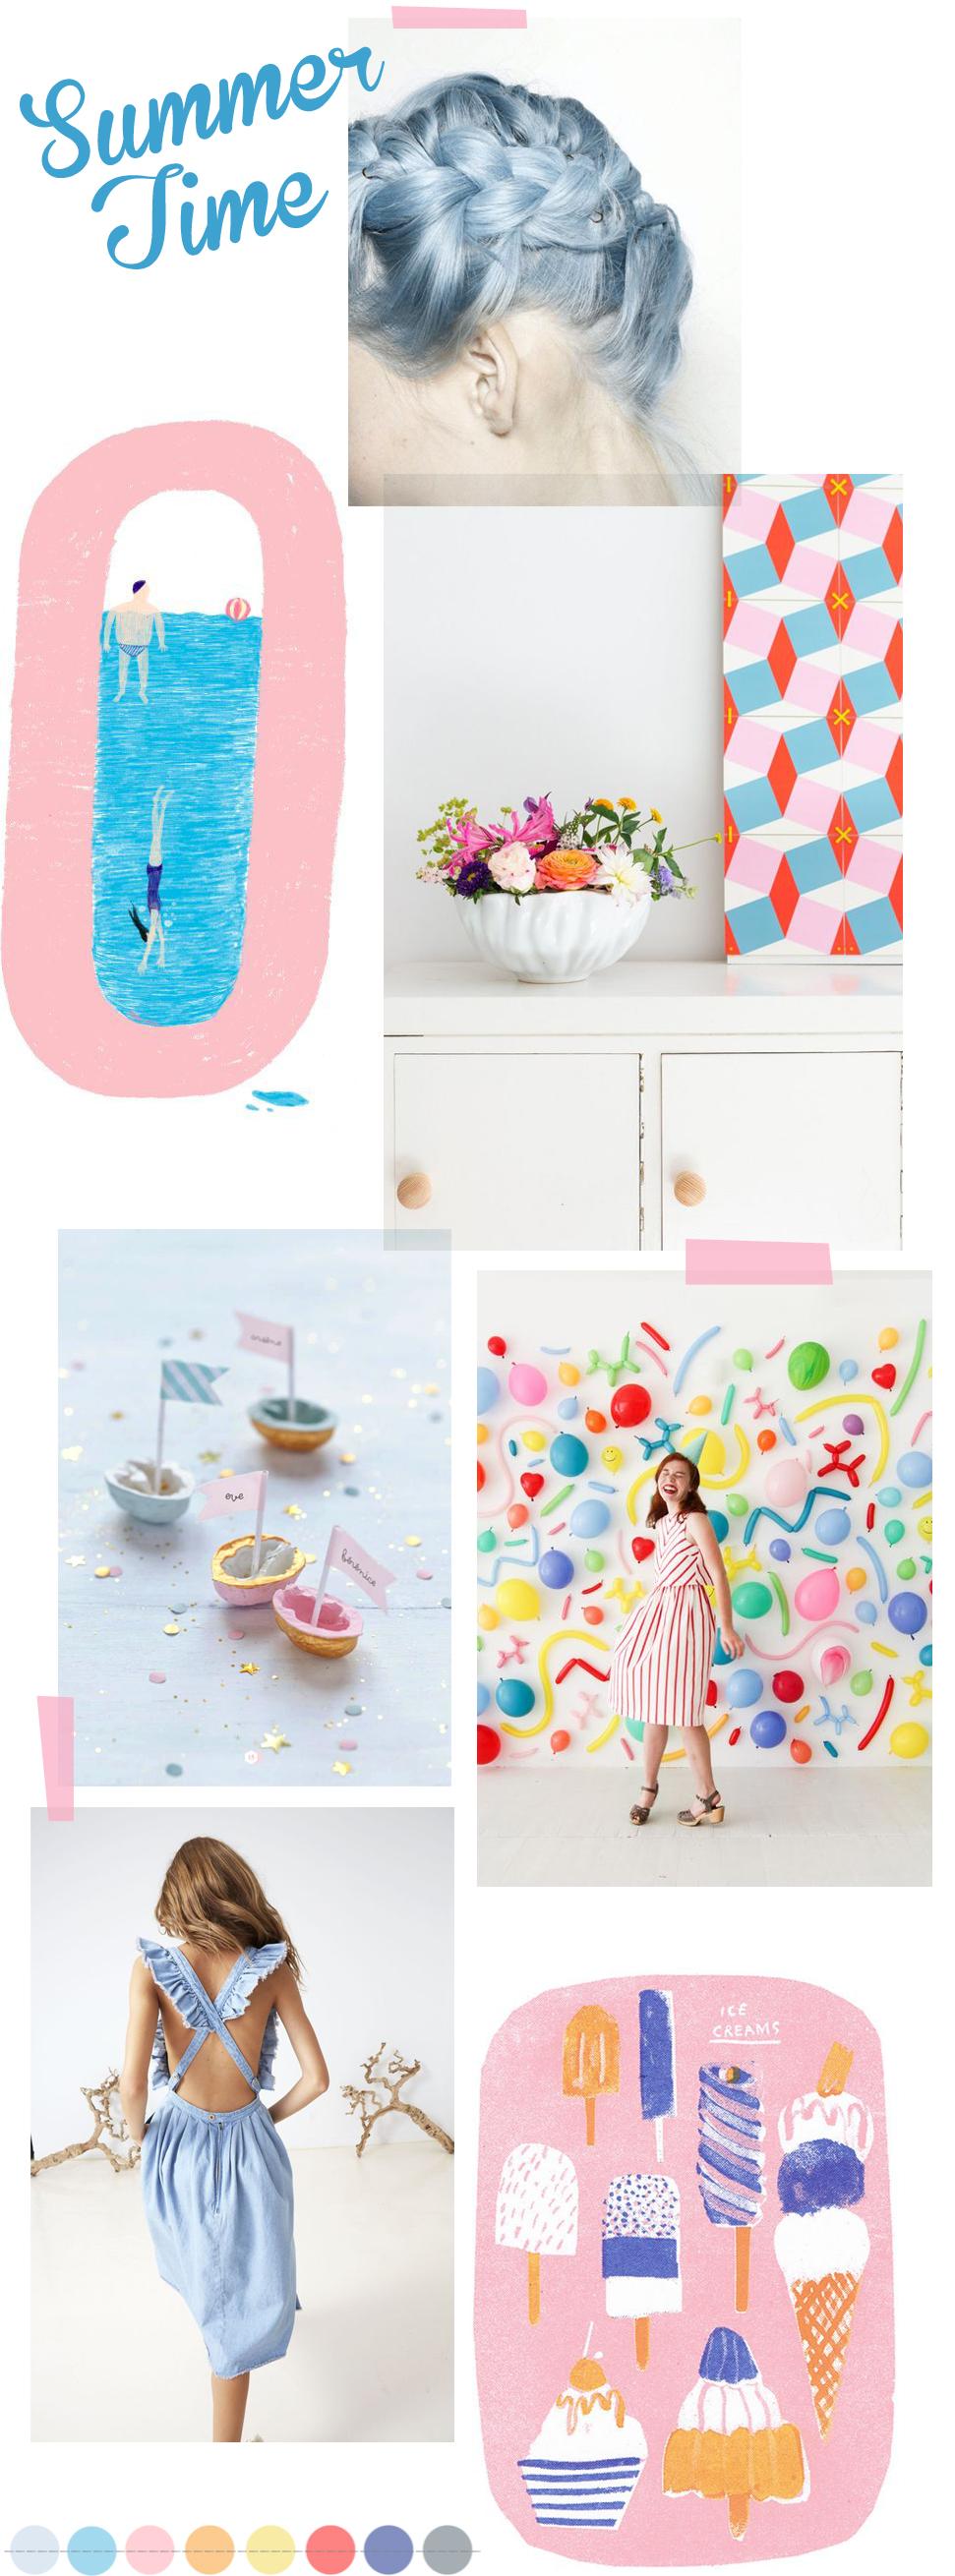 summer-pastel-moodboard